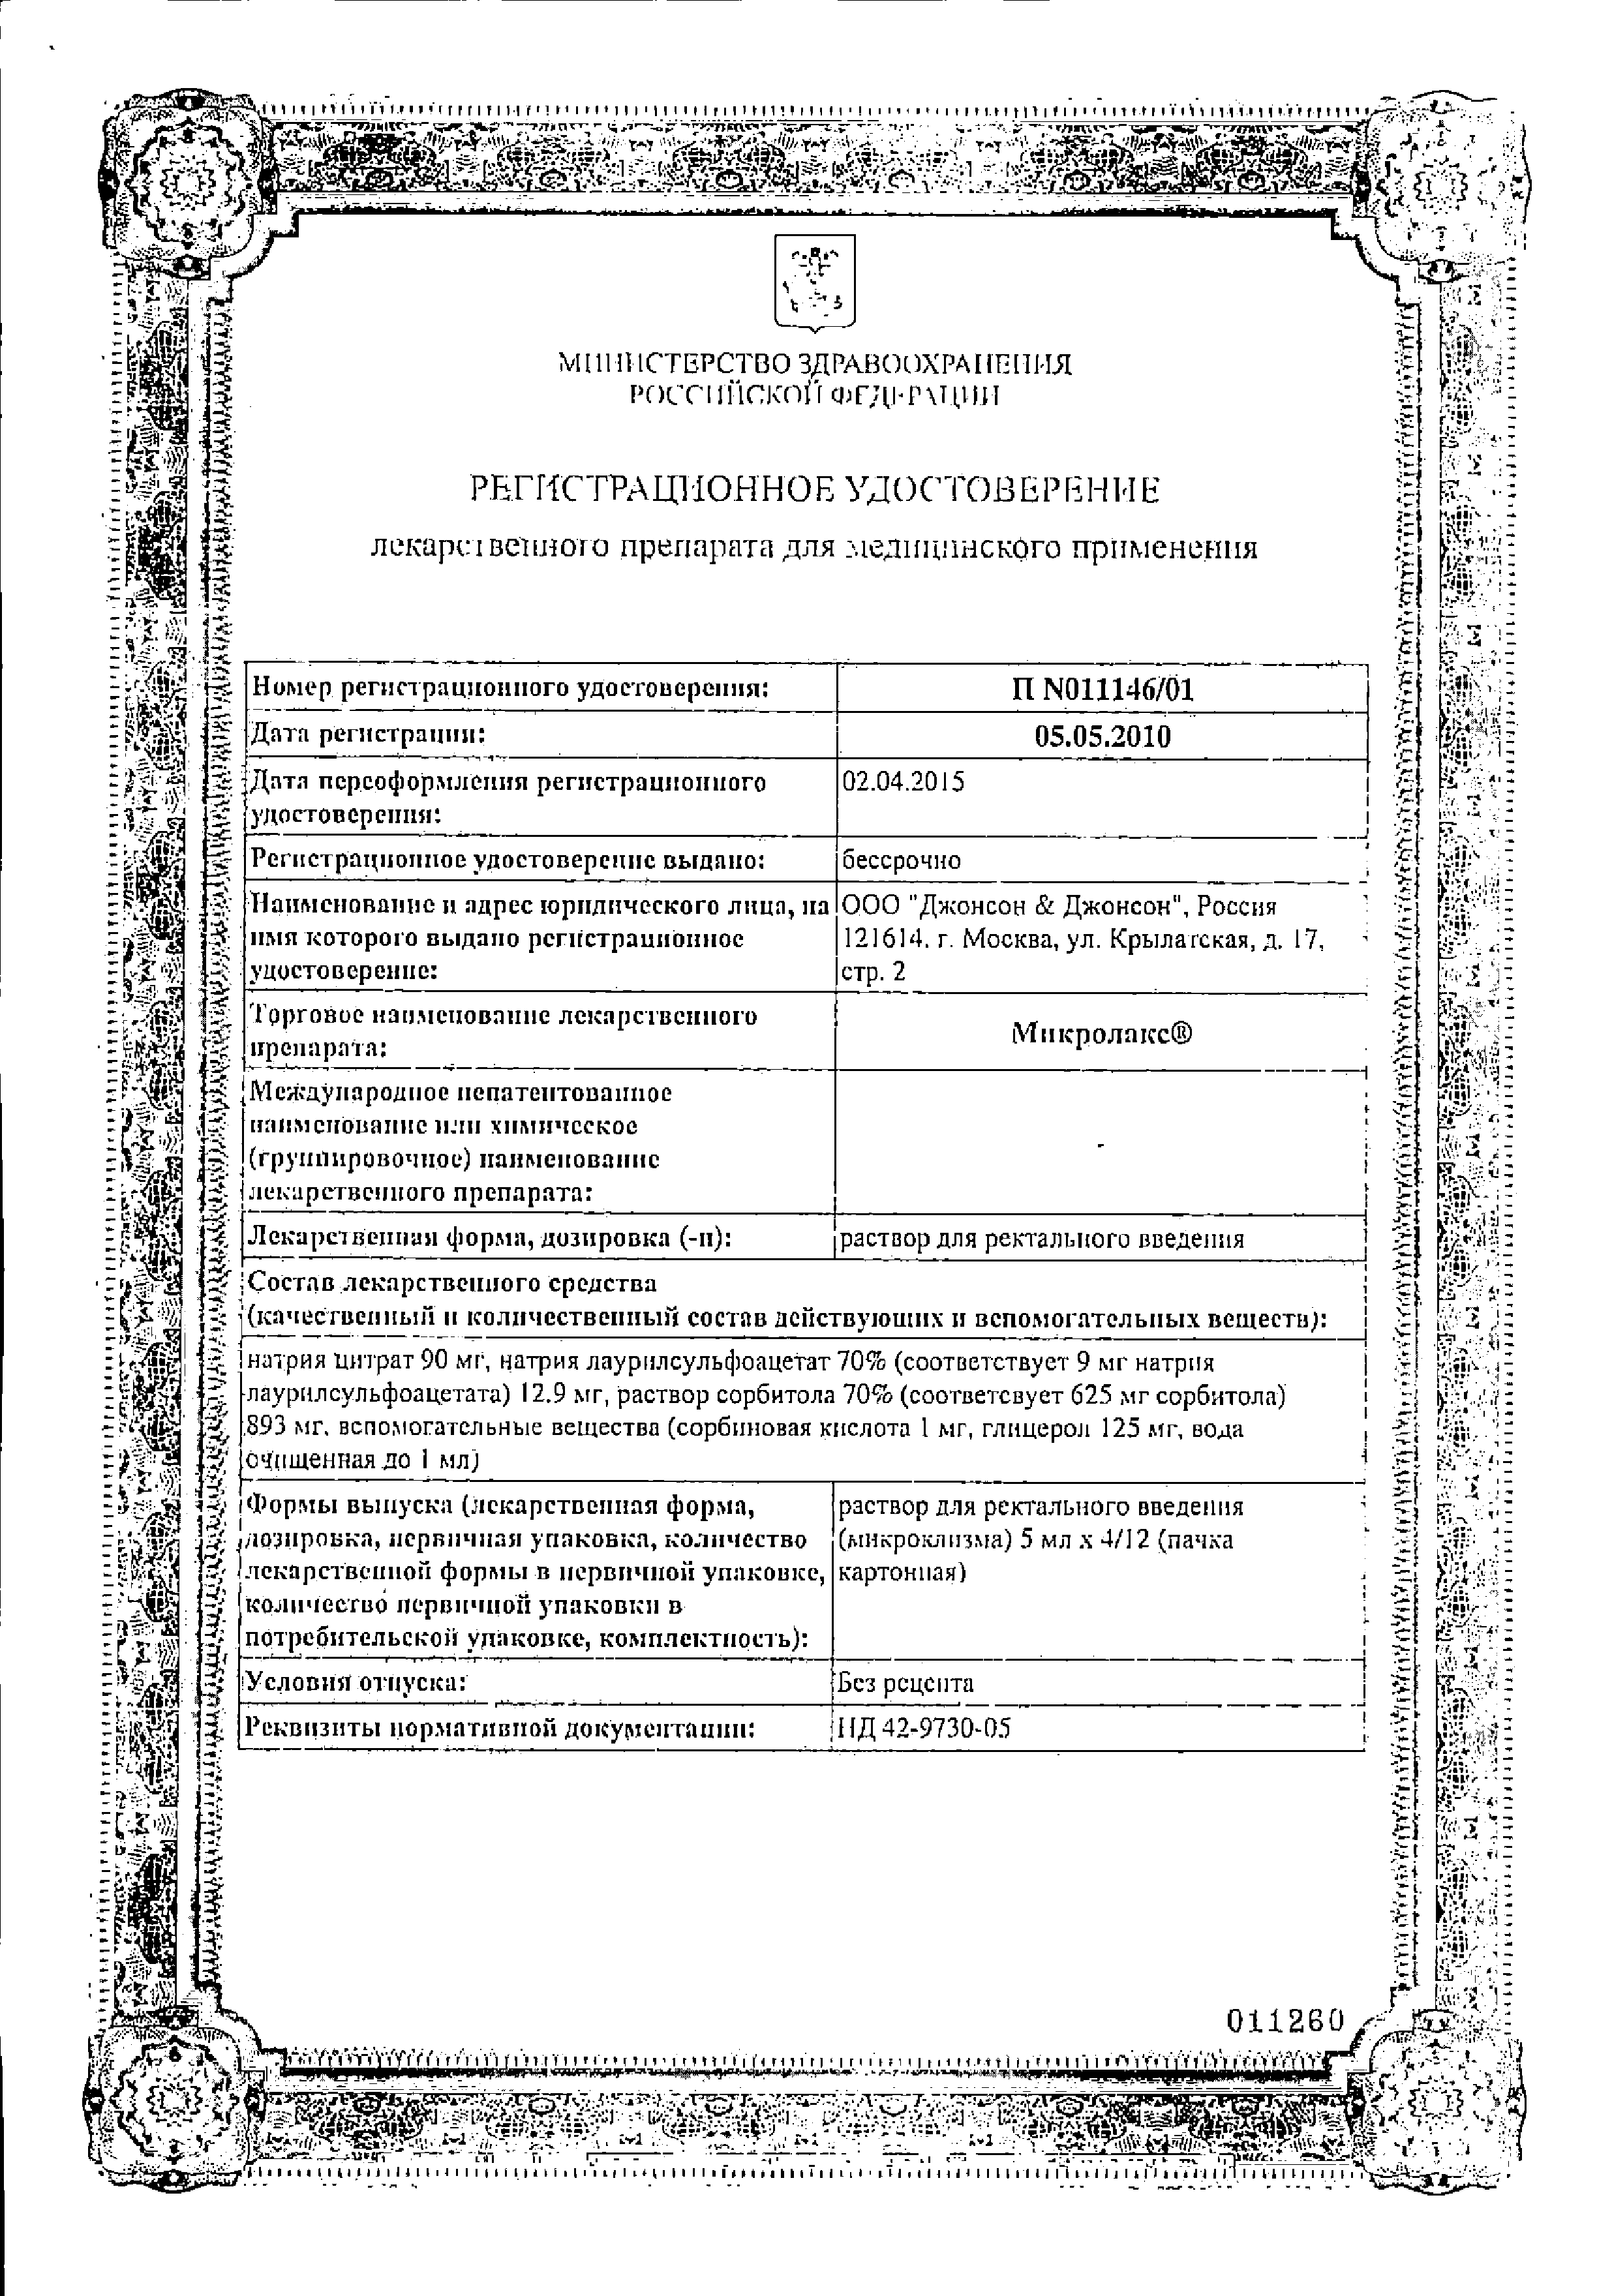 Микролакс сертификат